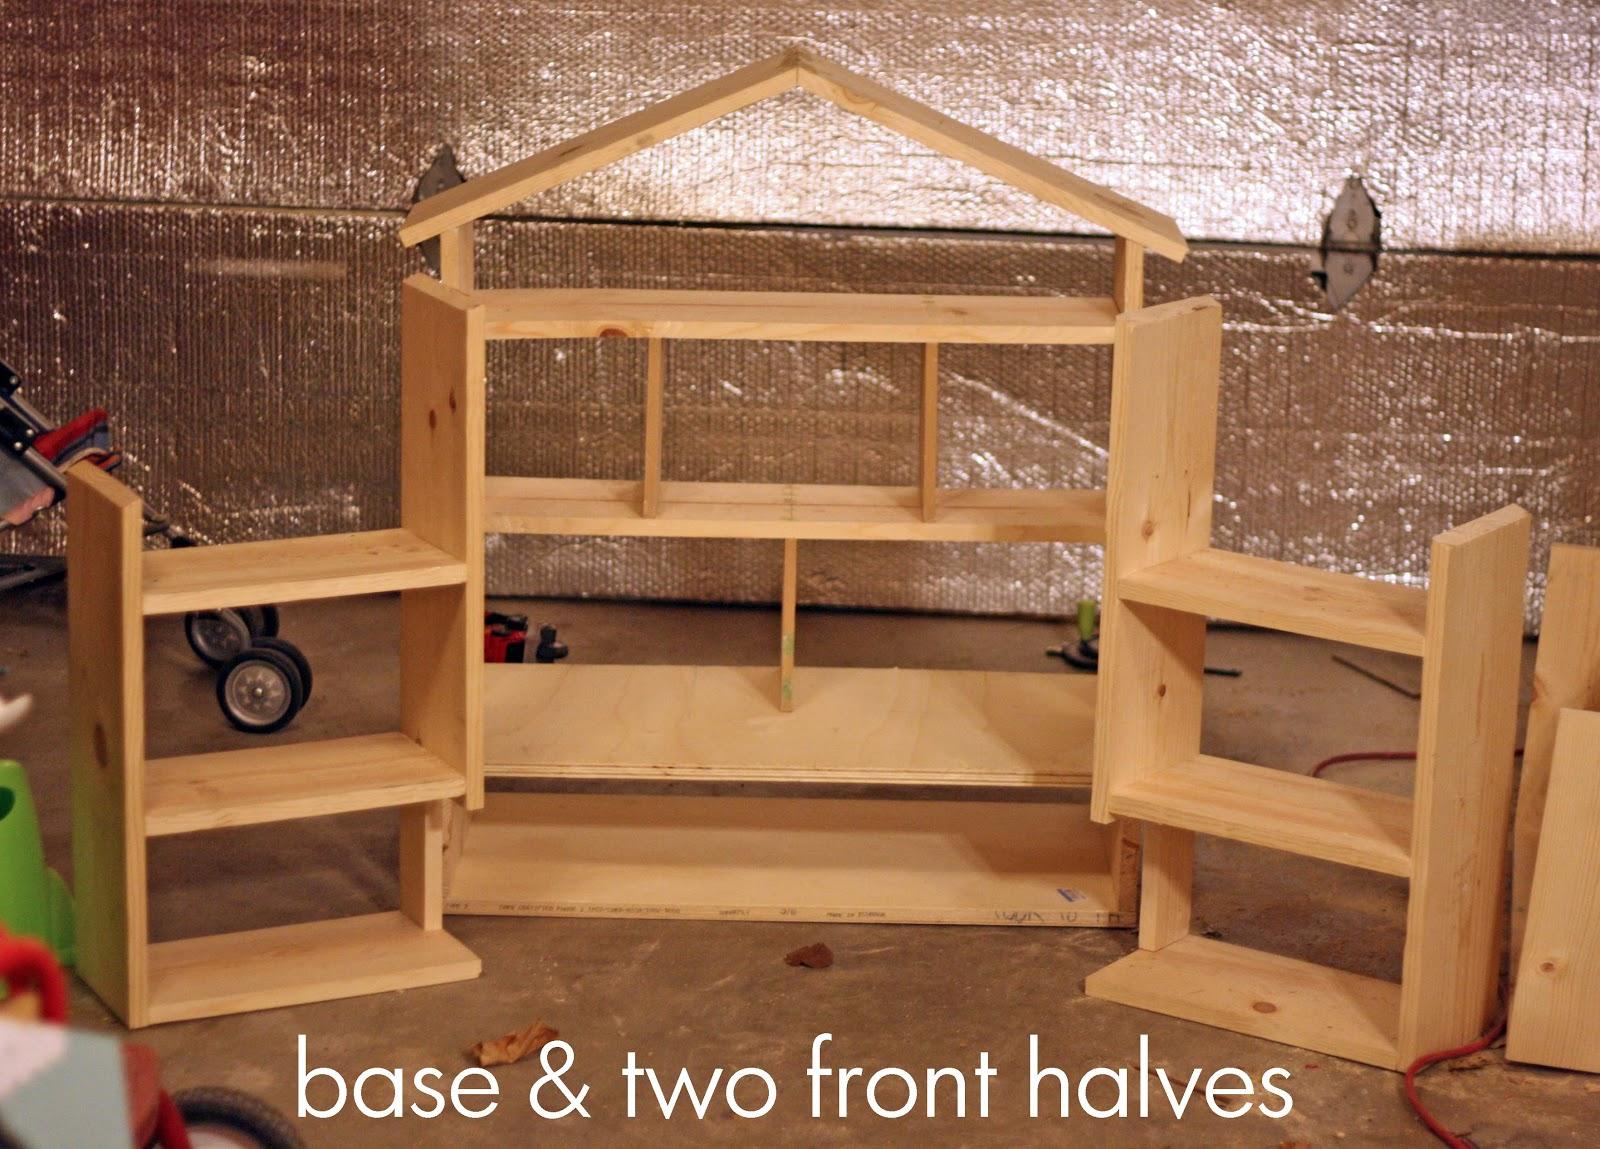 Doll House Part 2: House Built